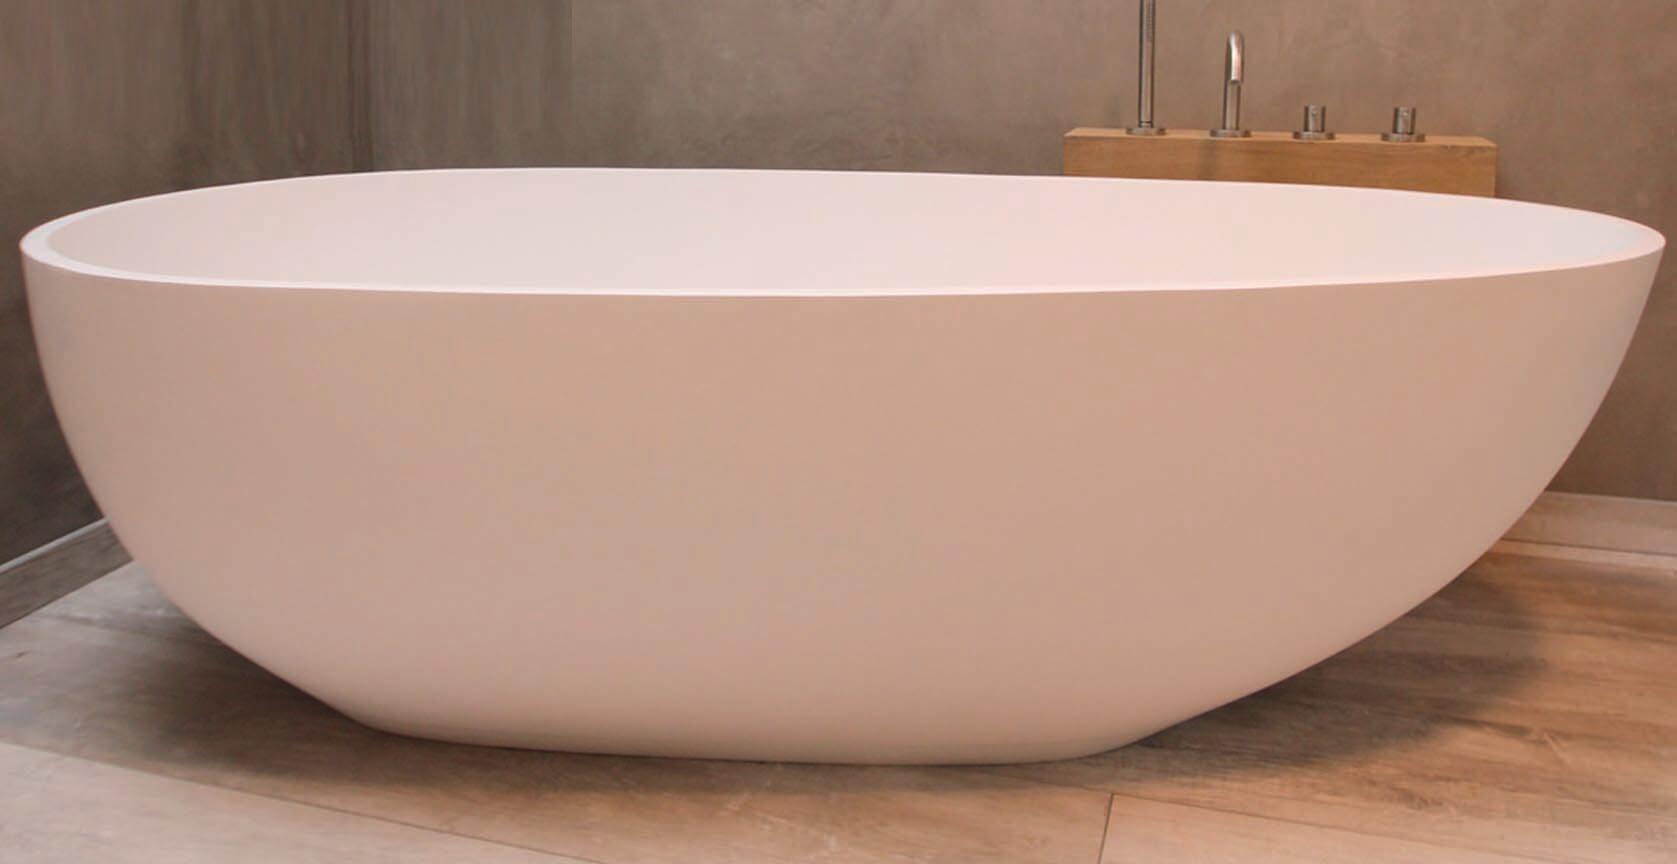 Solid Surface Badkamer : Badkamer factory online shop luca sanitair vasca vrijstaand bad